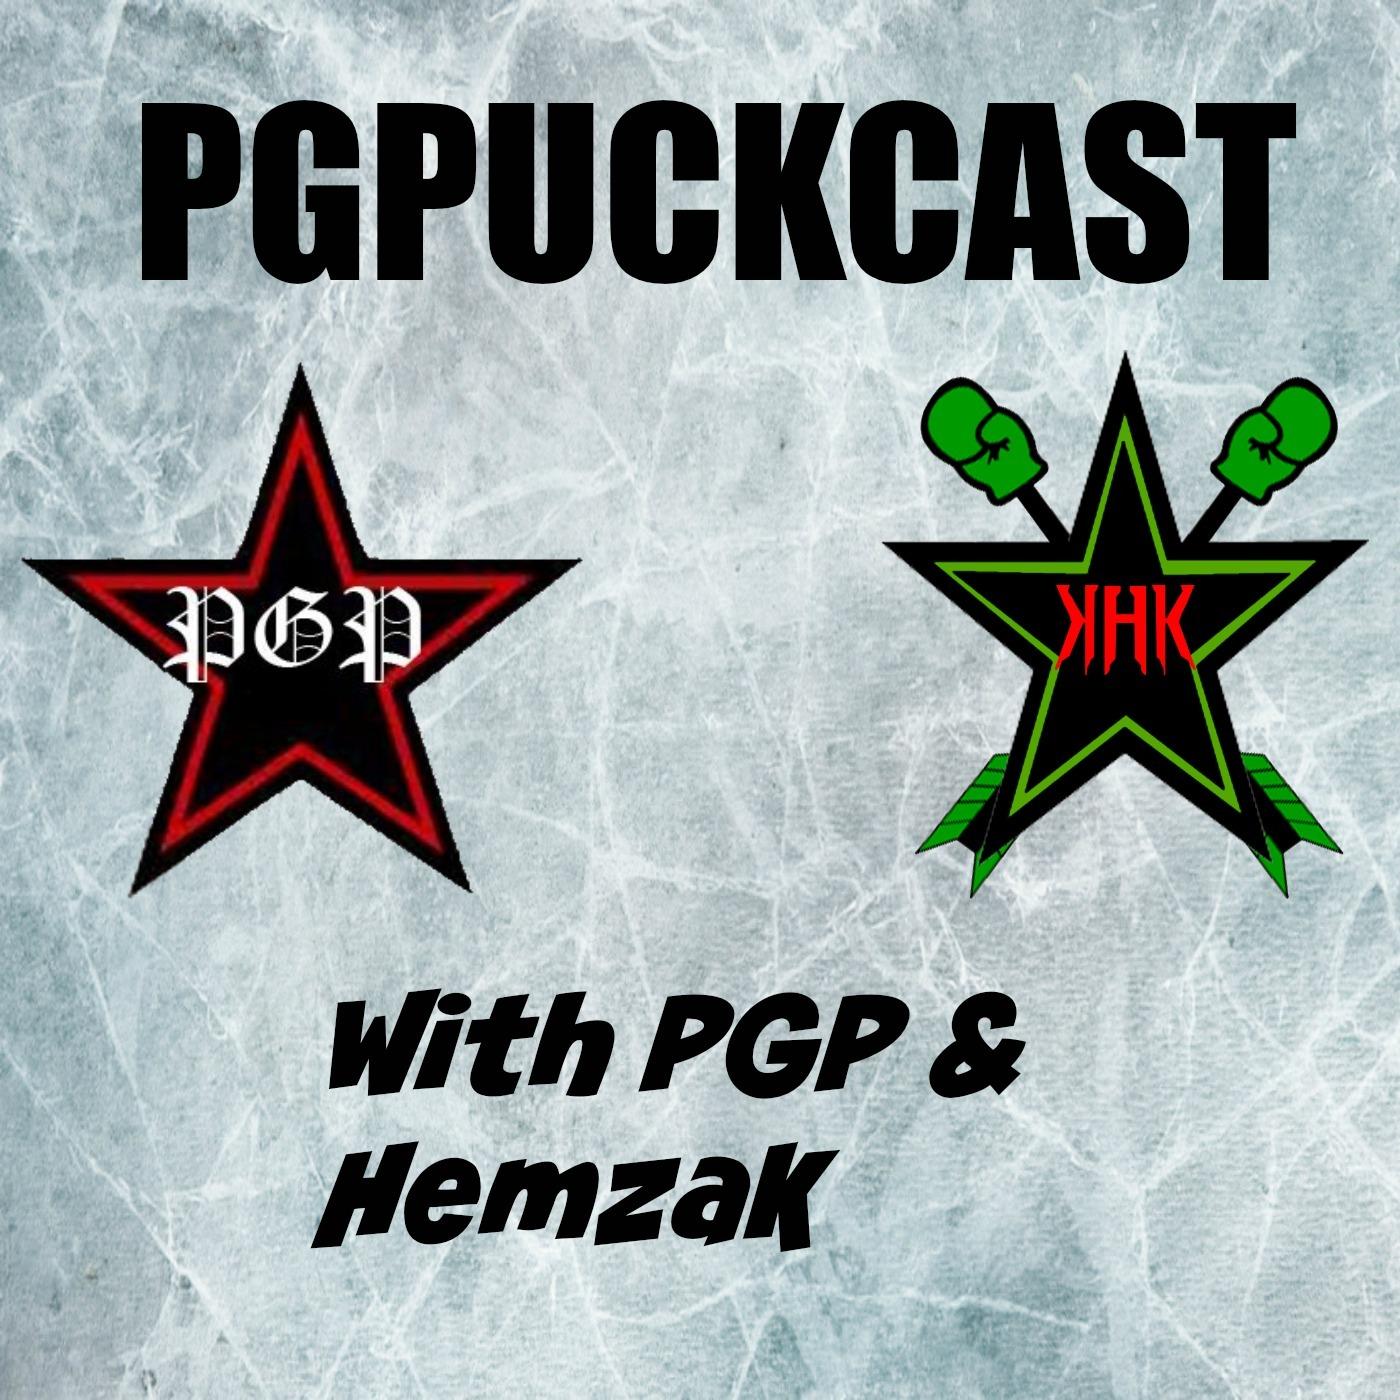 PGPuckcast